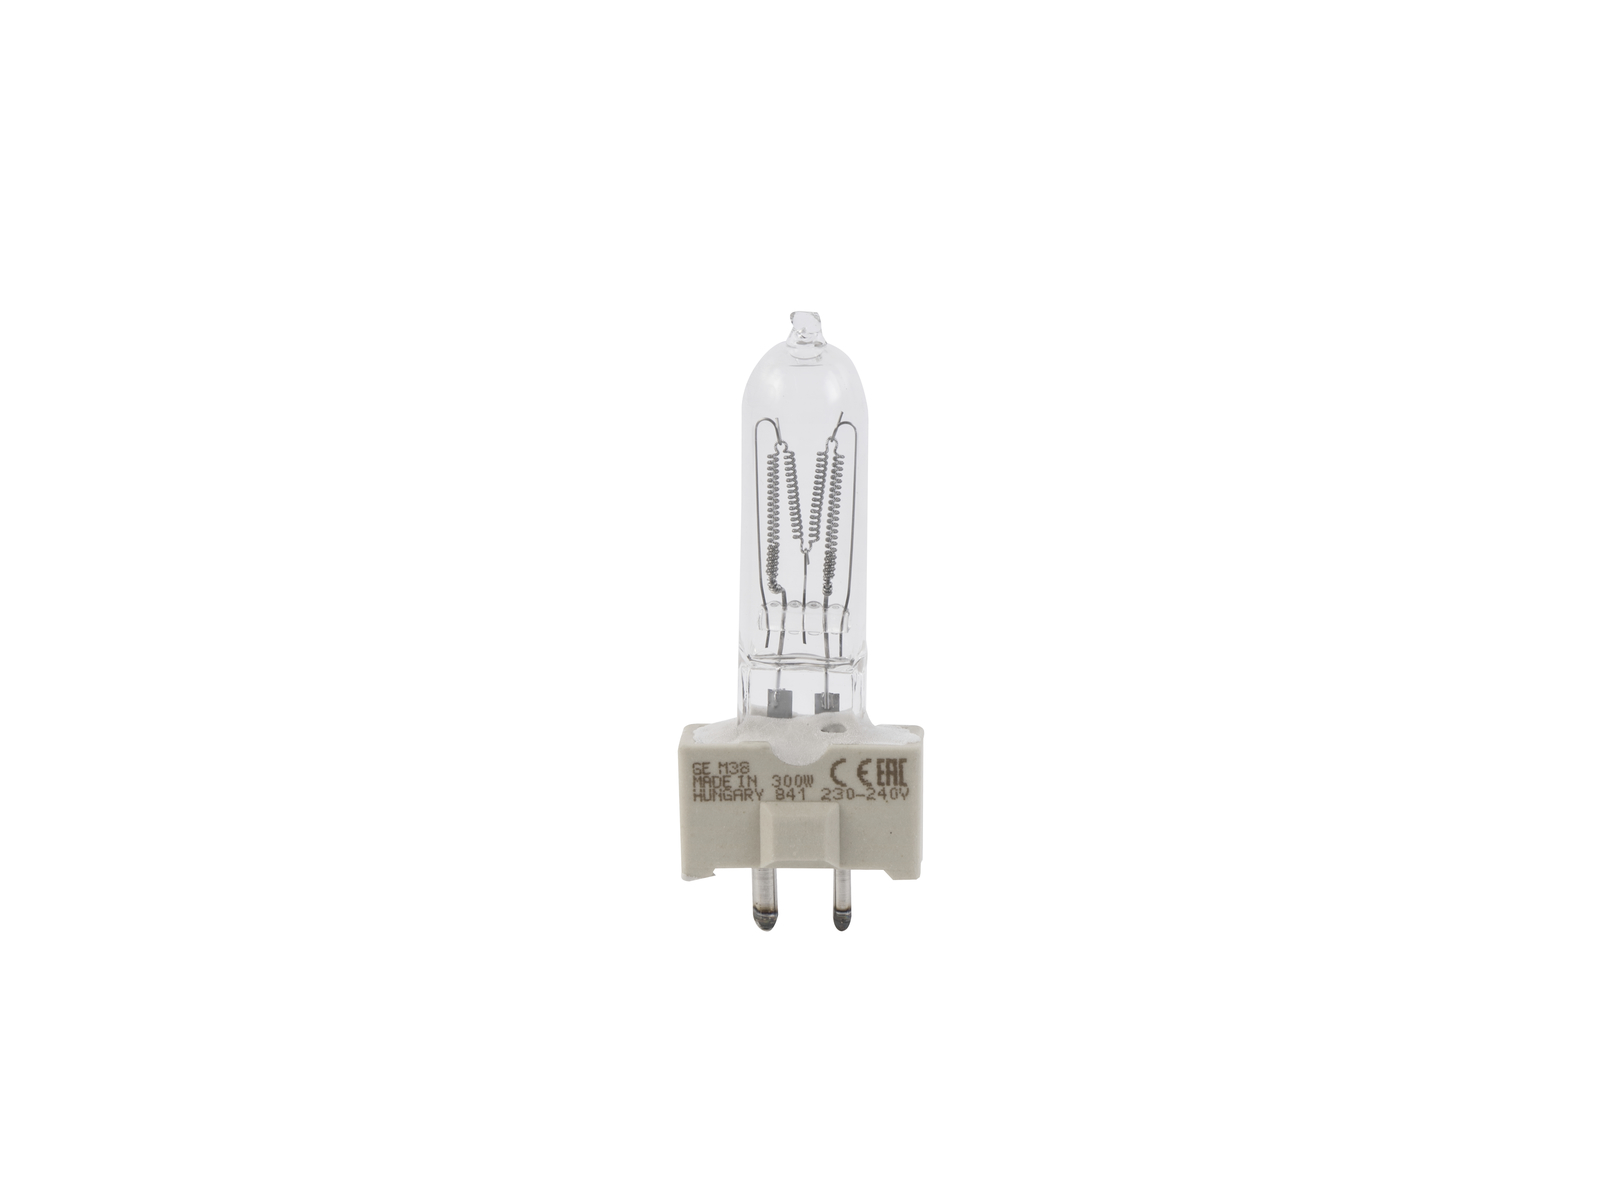 Lampada Lampadina GE M38/240V 300W Attacco GY-9.5 2000h